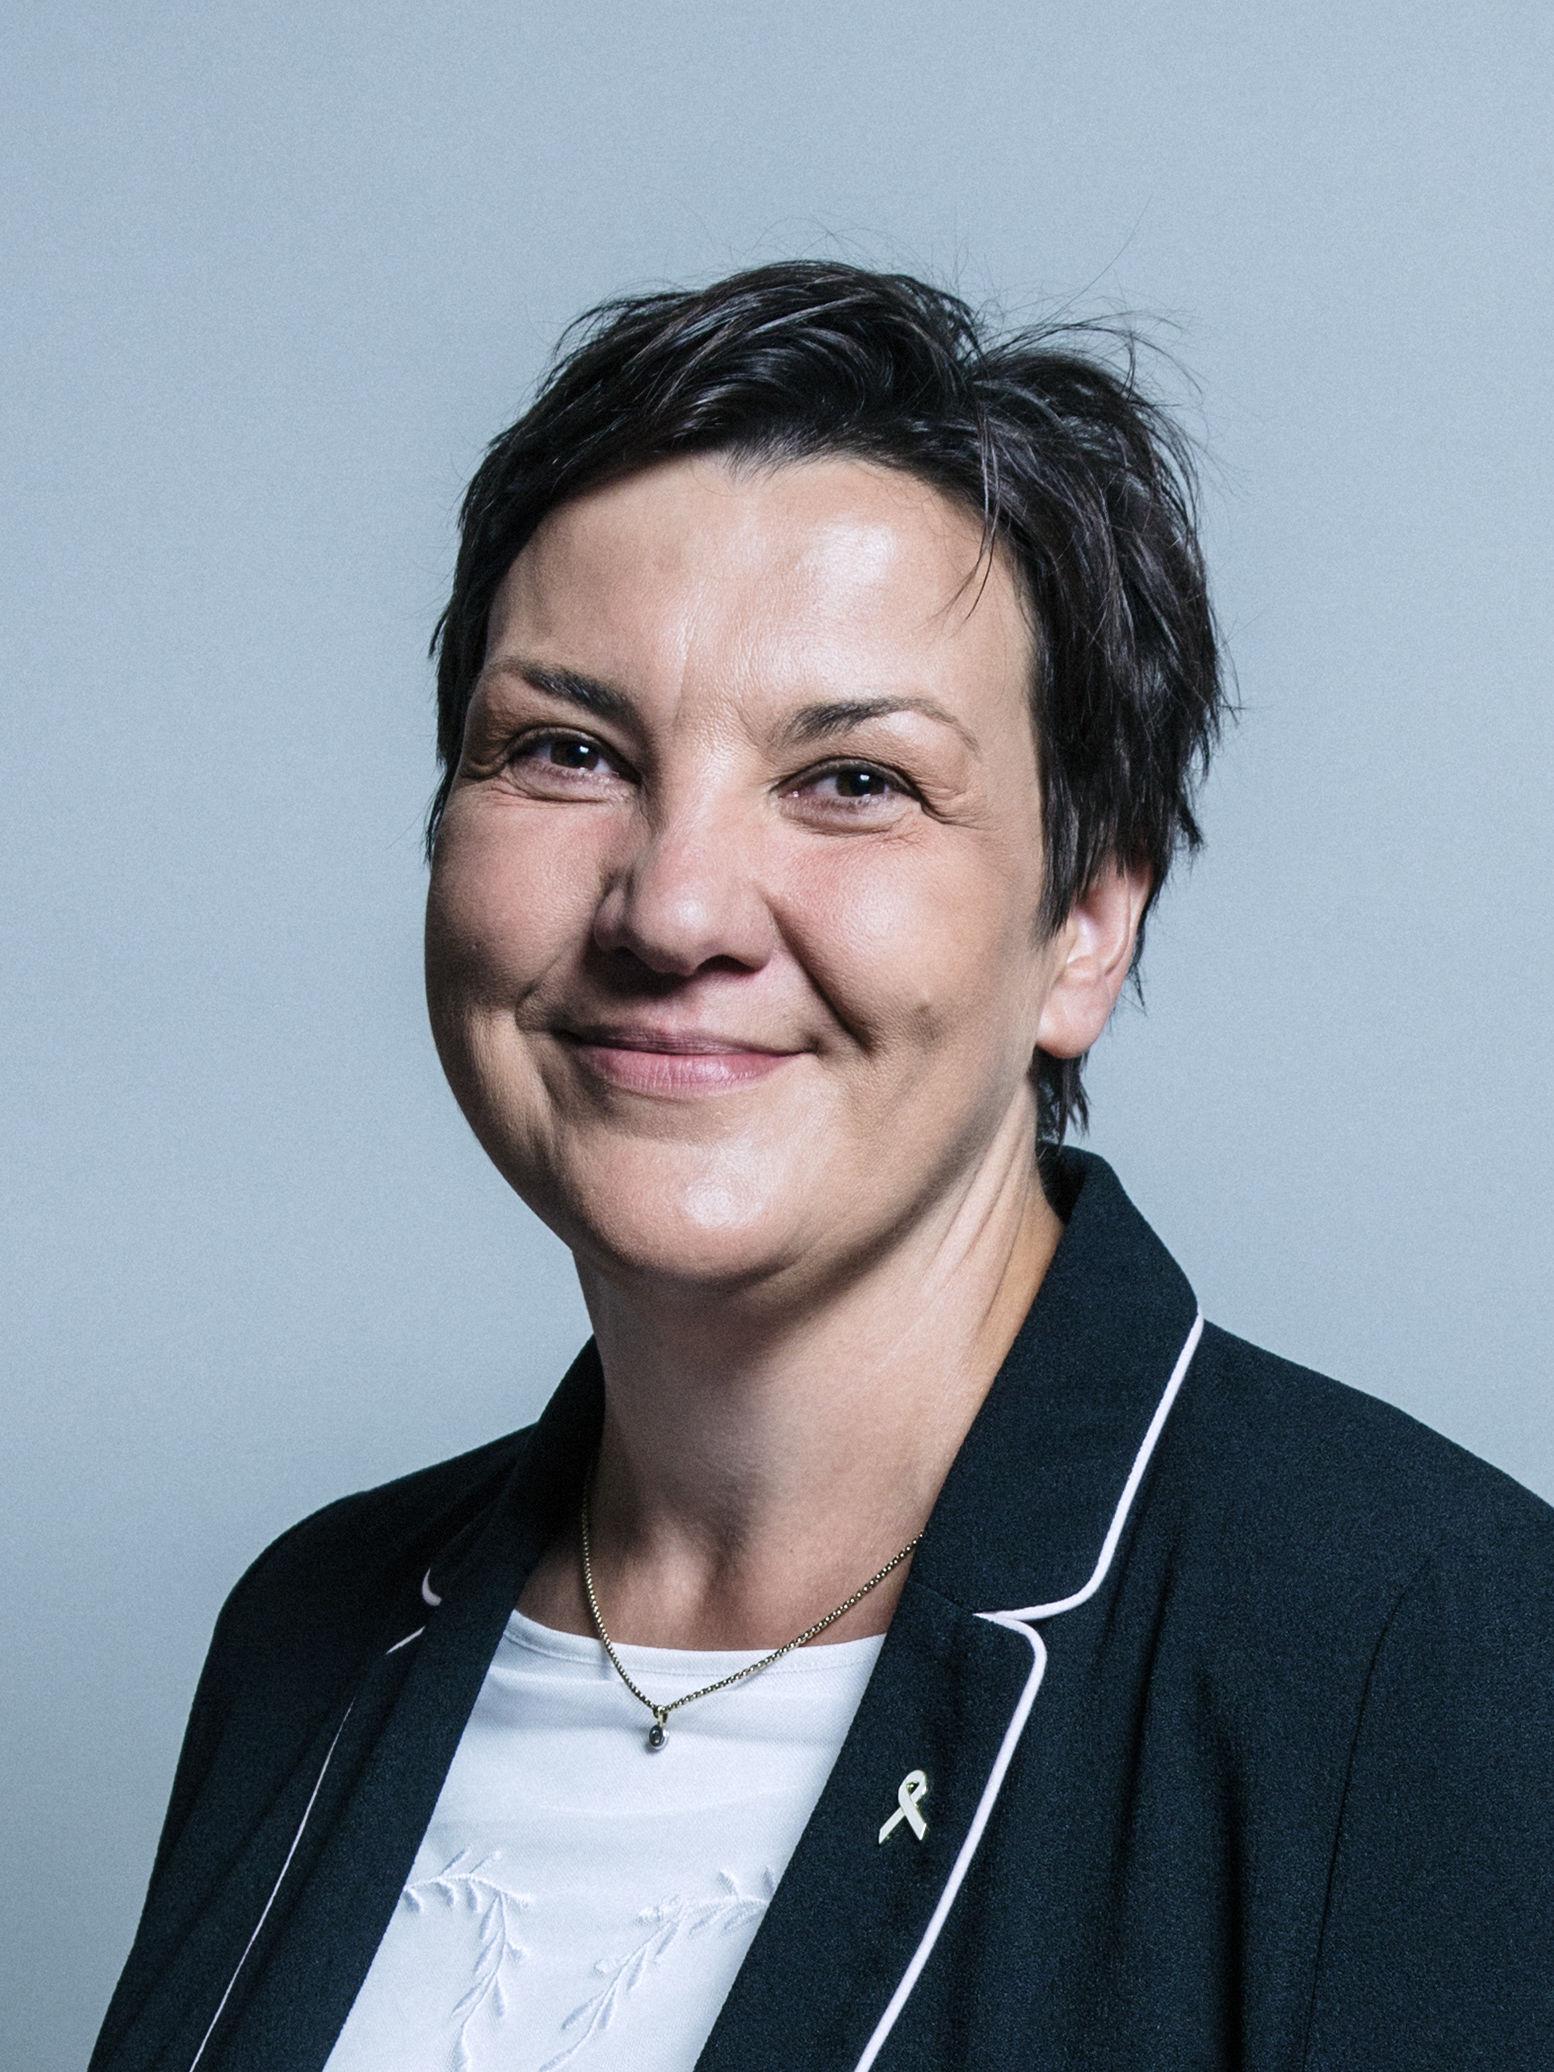 Tonia Antoniazzi MP